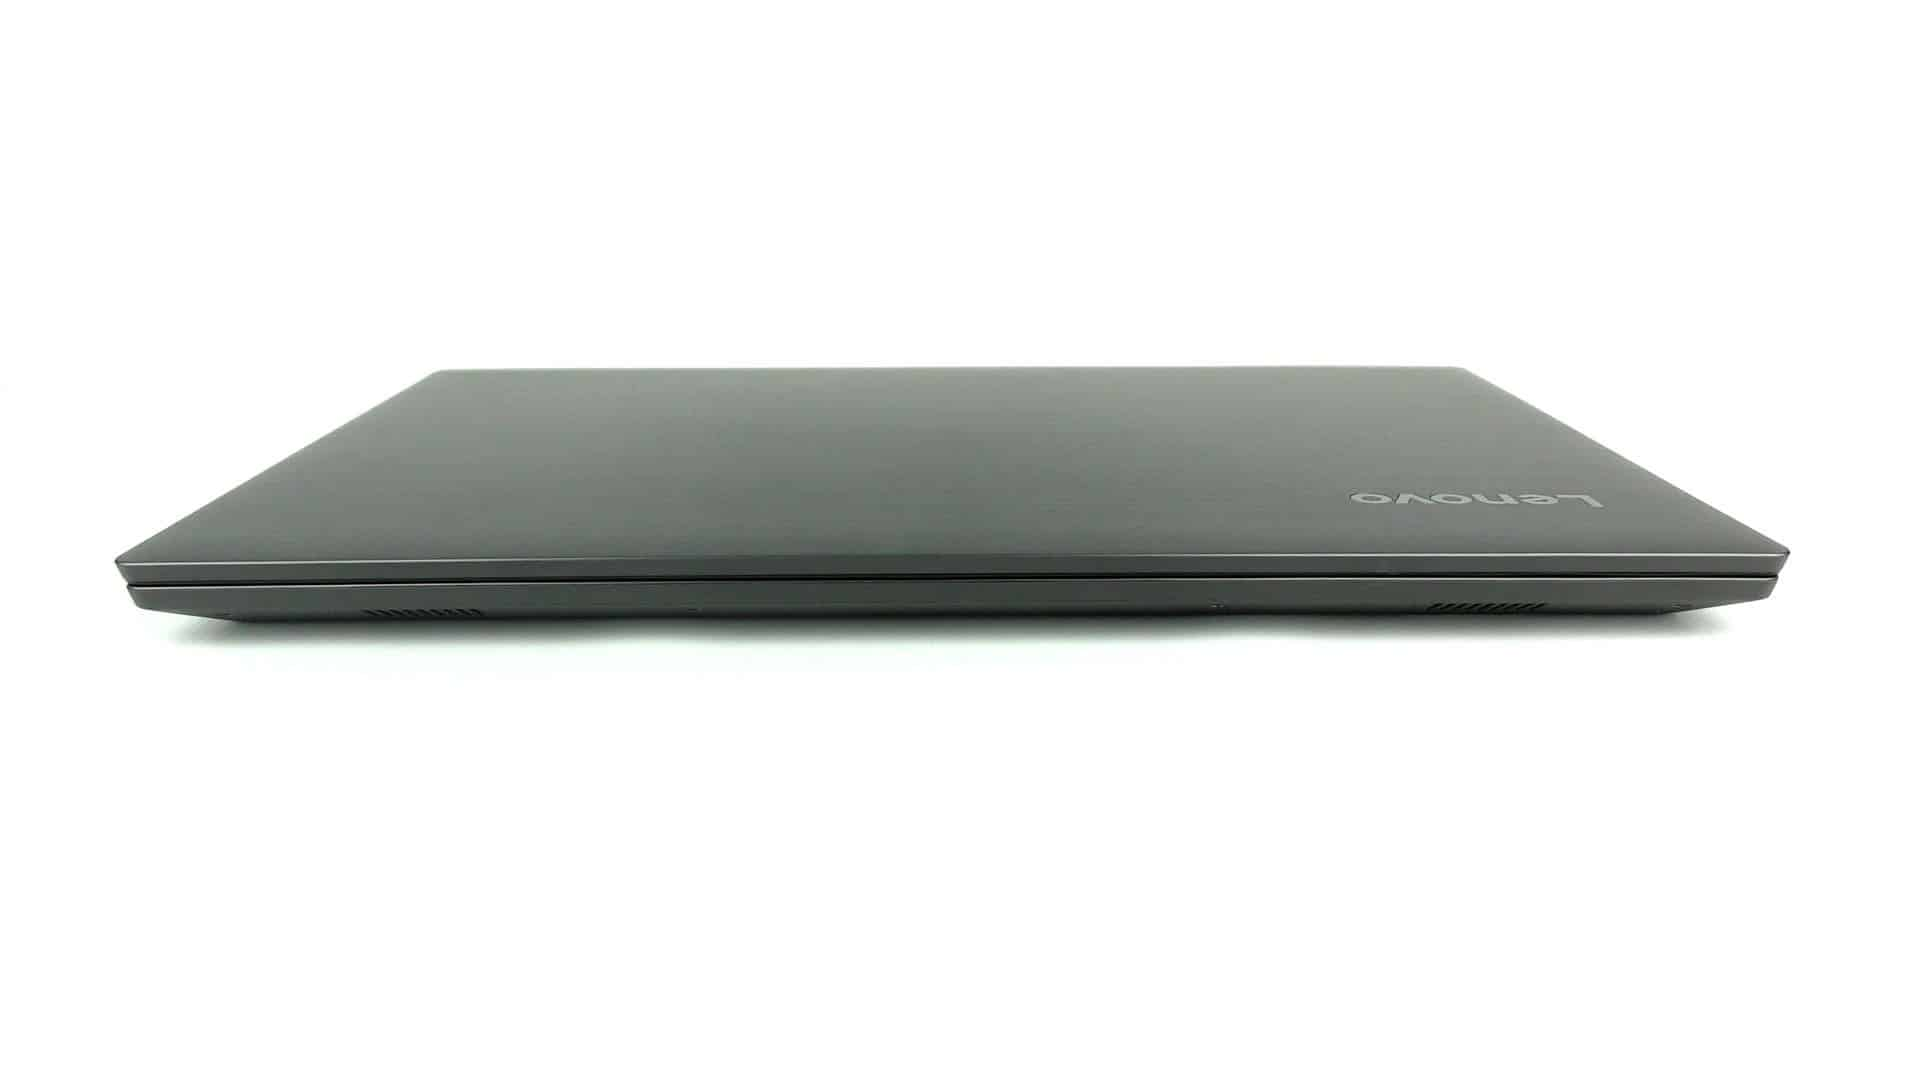 Lenovo Essential V330-15 - front notebooka